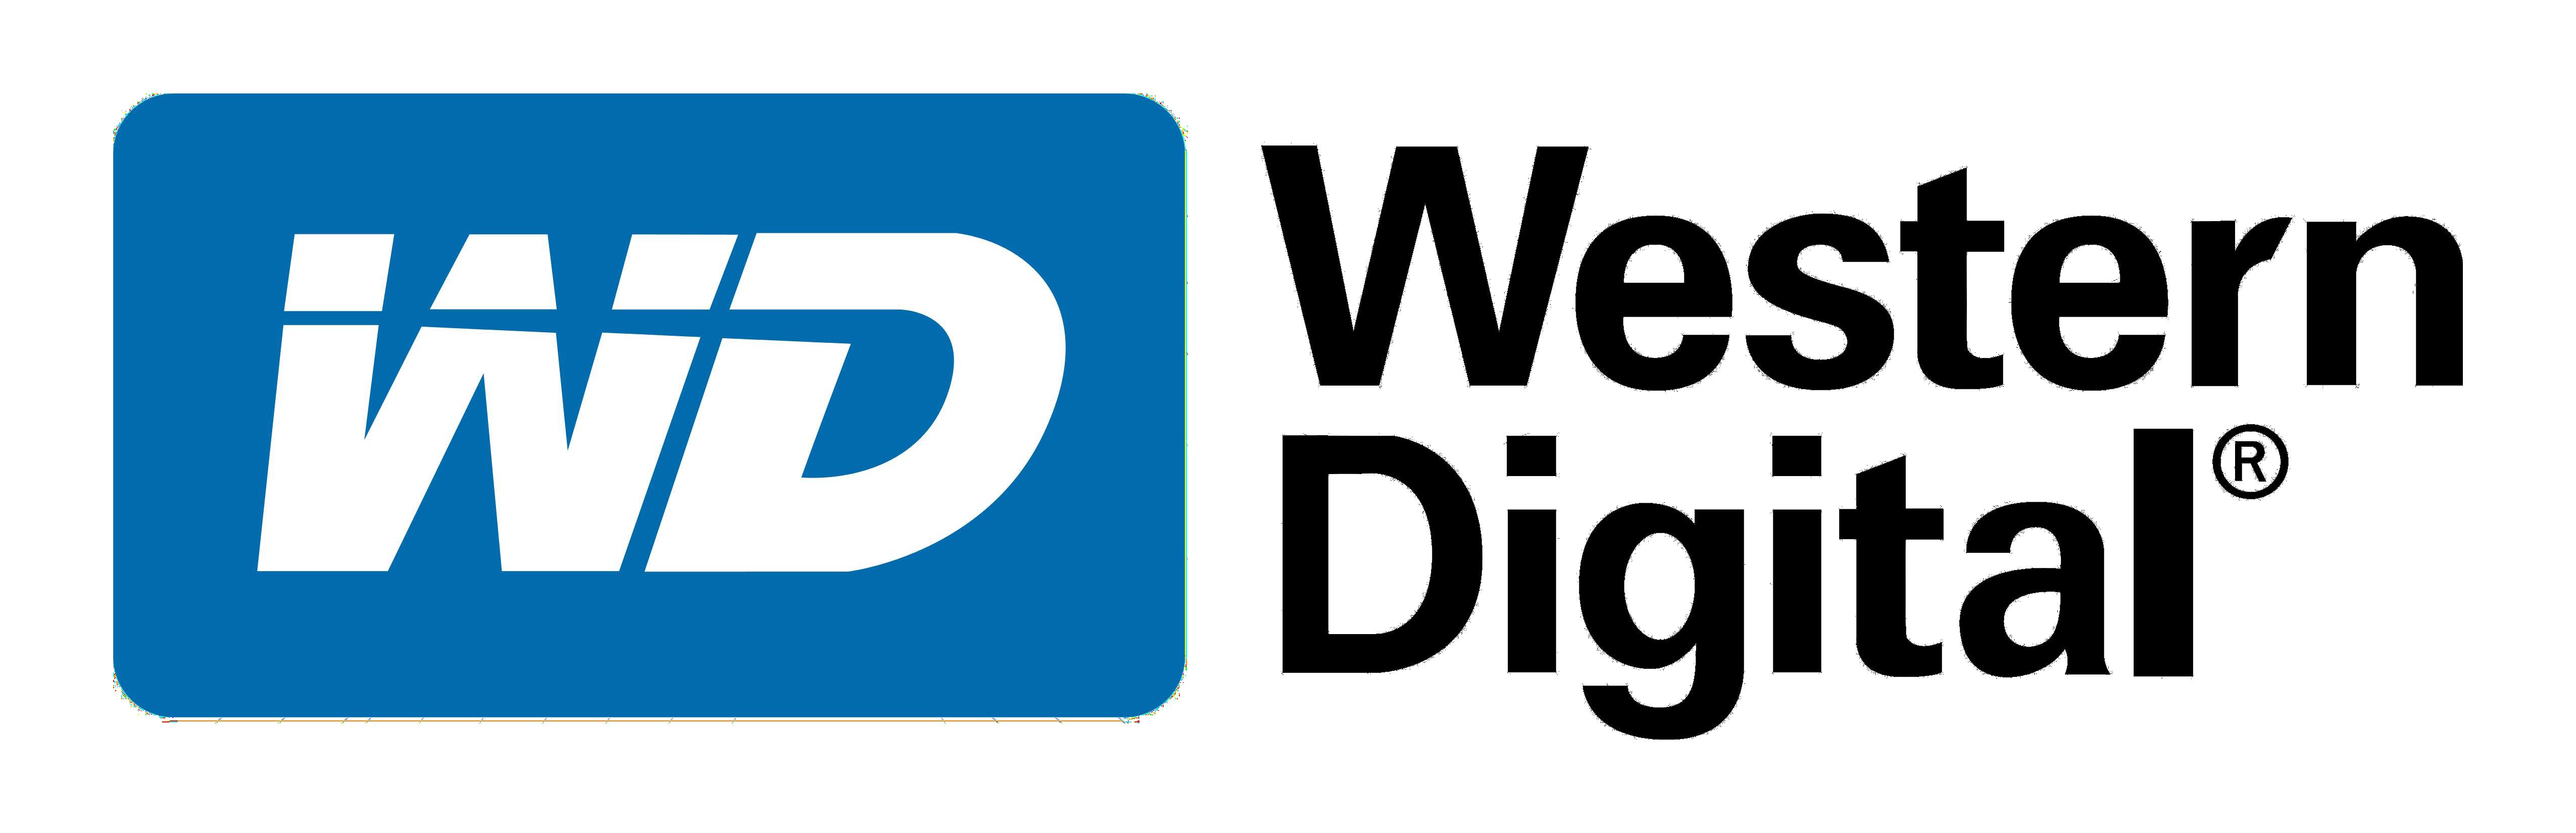 Western Digital Logo PNG Image.